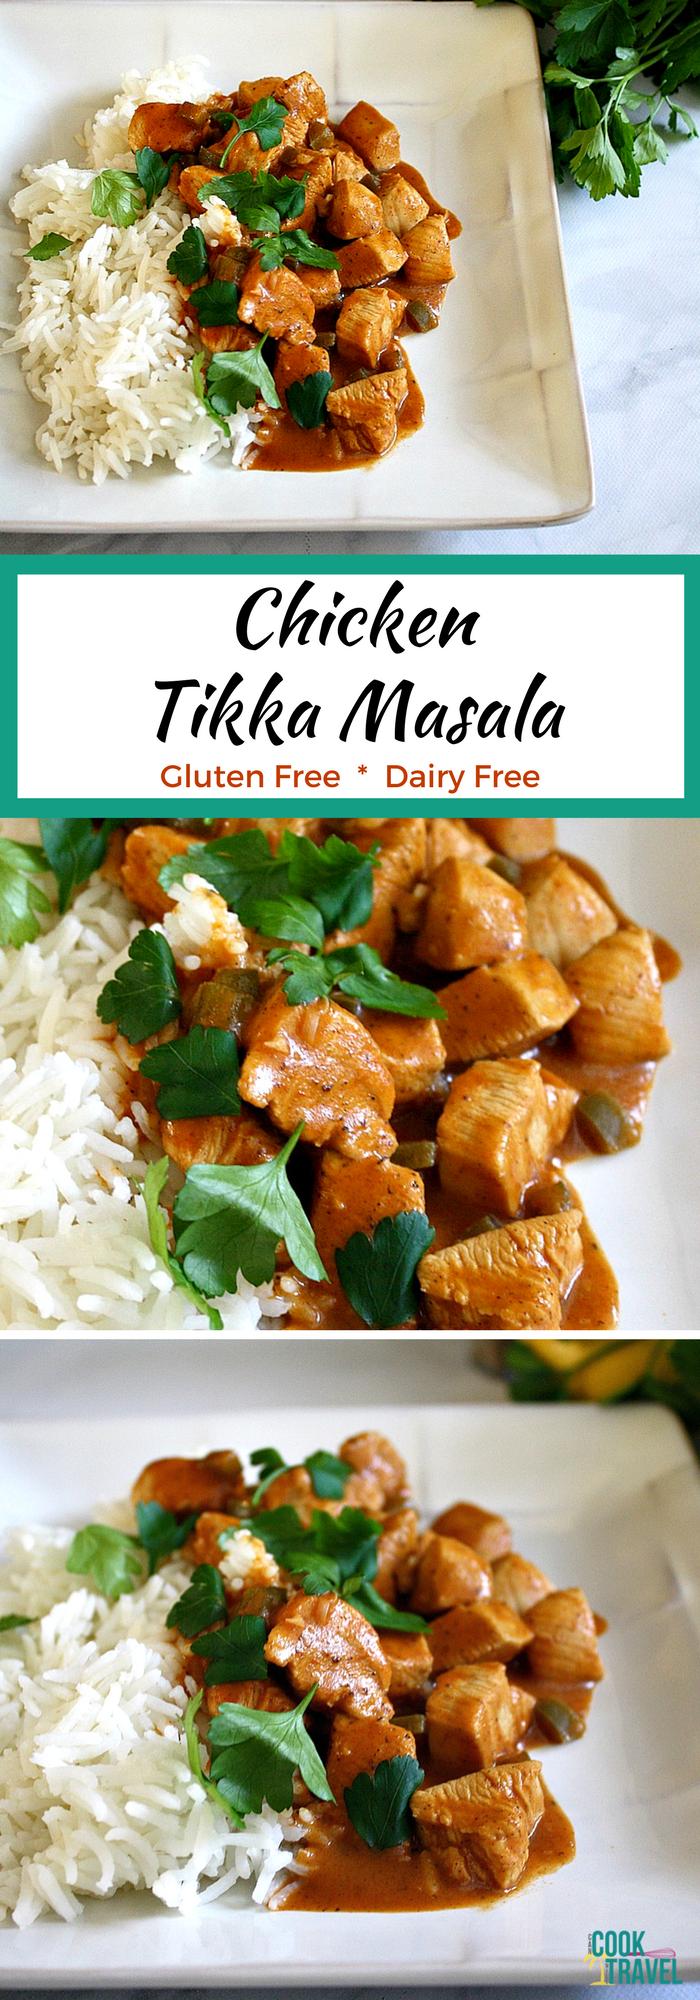 Dairy Free Chicken Tikka Masala